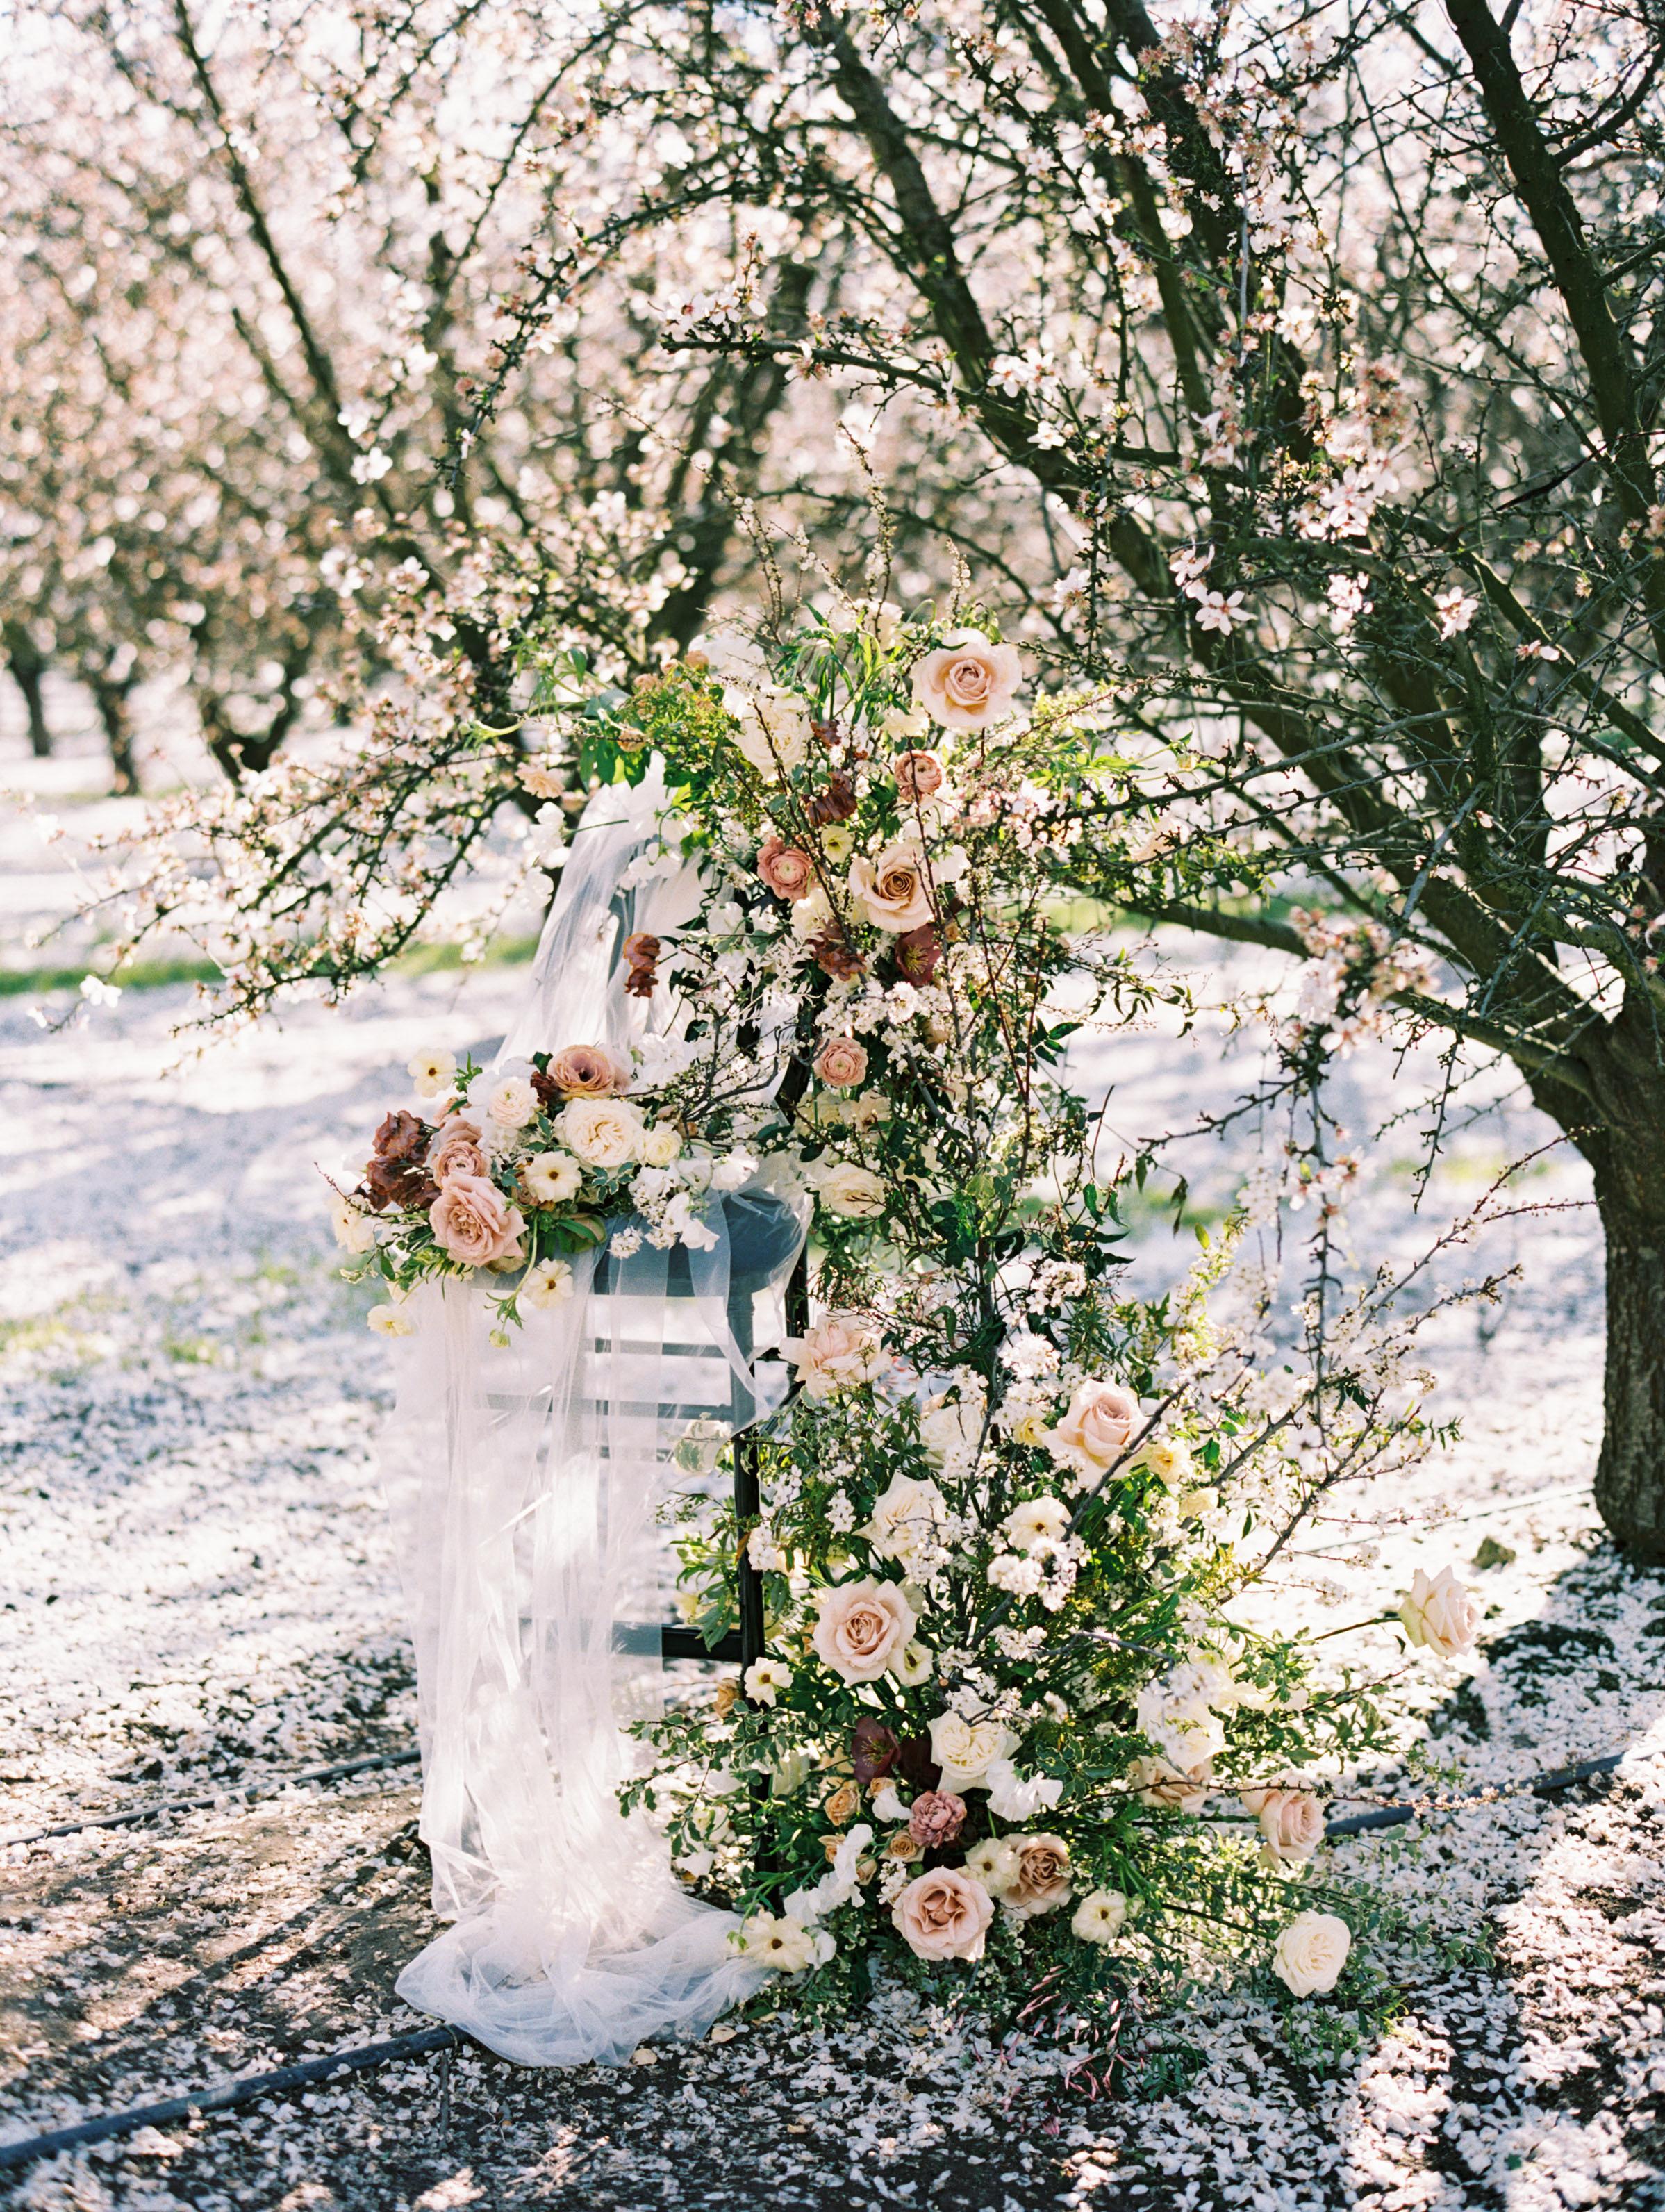 Alond Grove Flower Decor.jpg